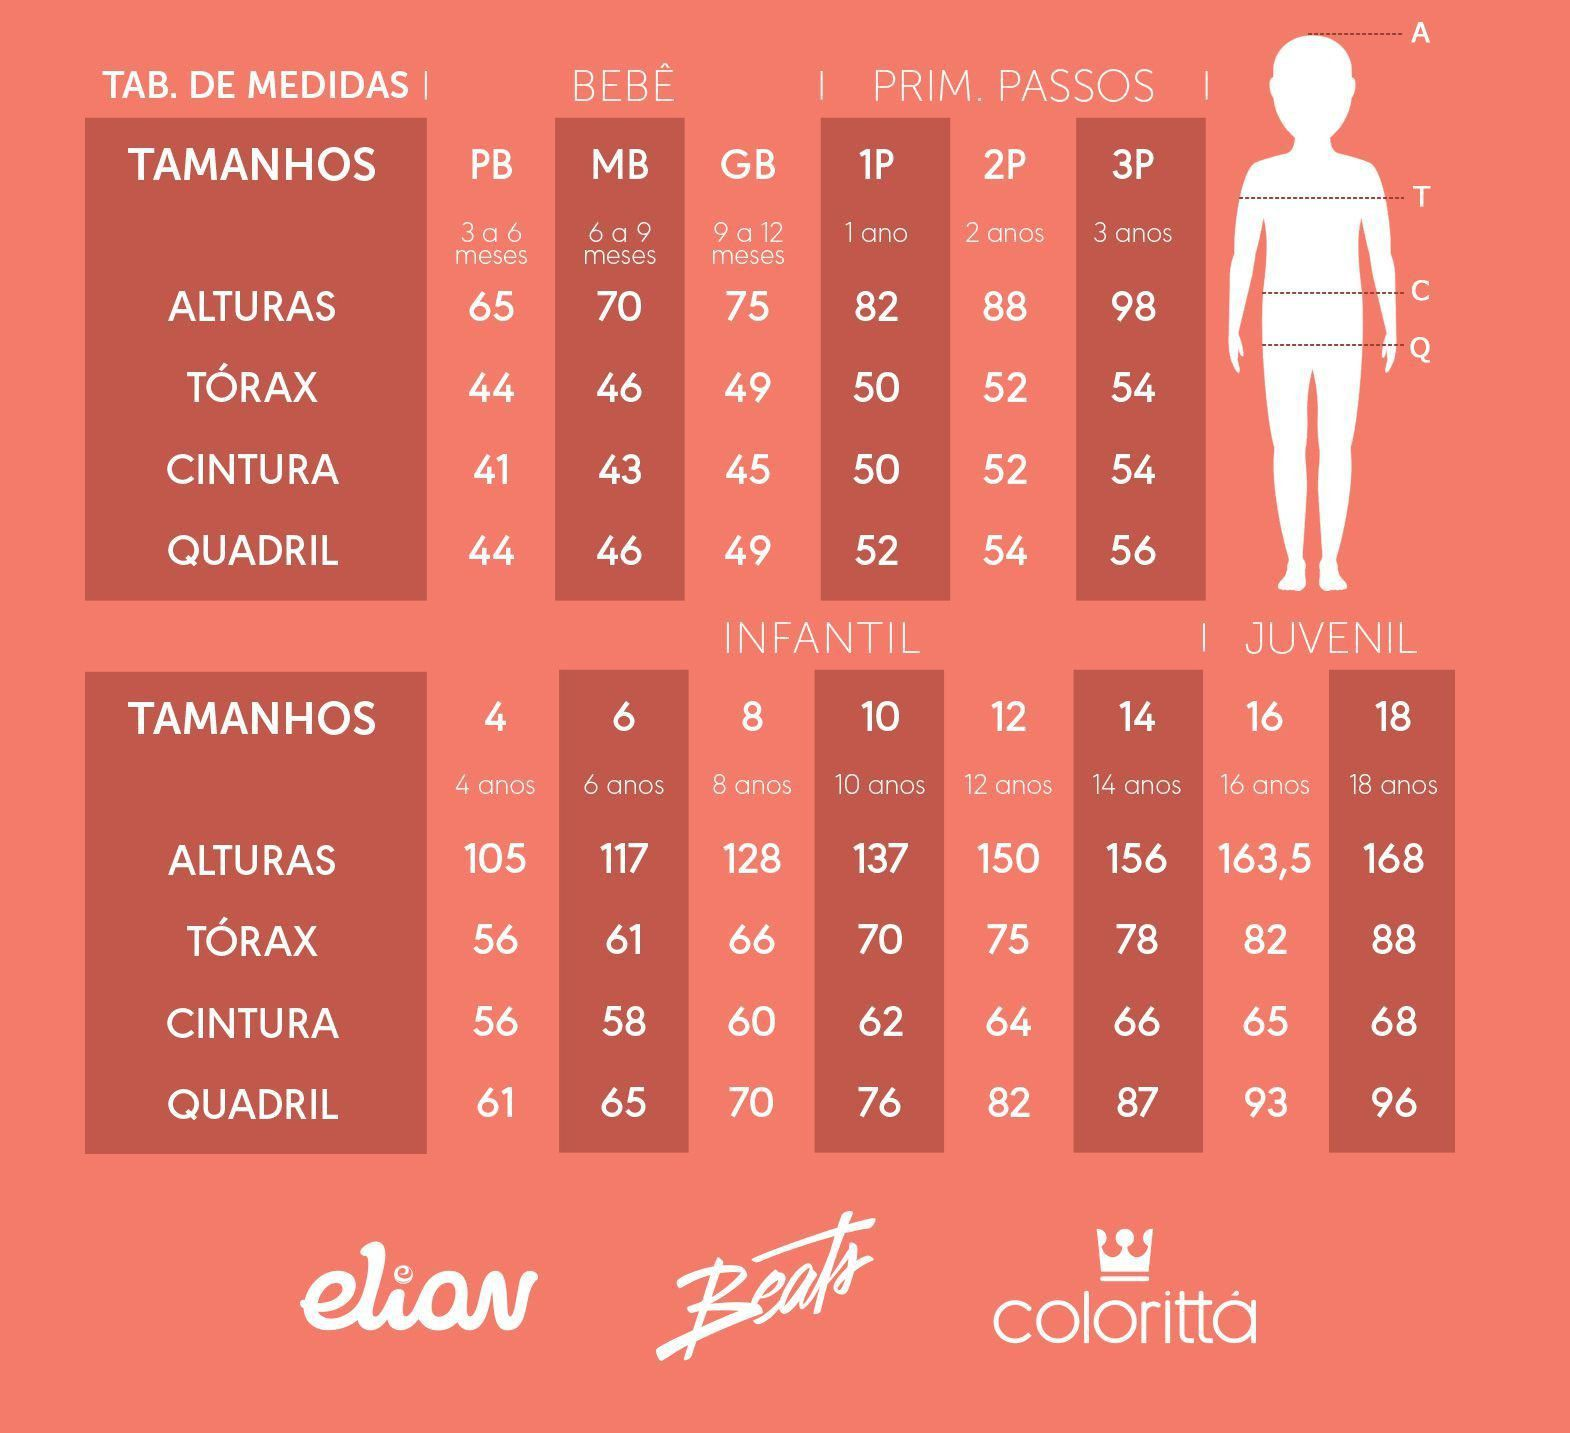 Kit Body Infantil Masculino Inverno Cinza Lion - Elian: Tabela de medidas